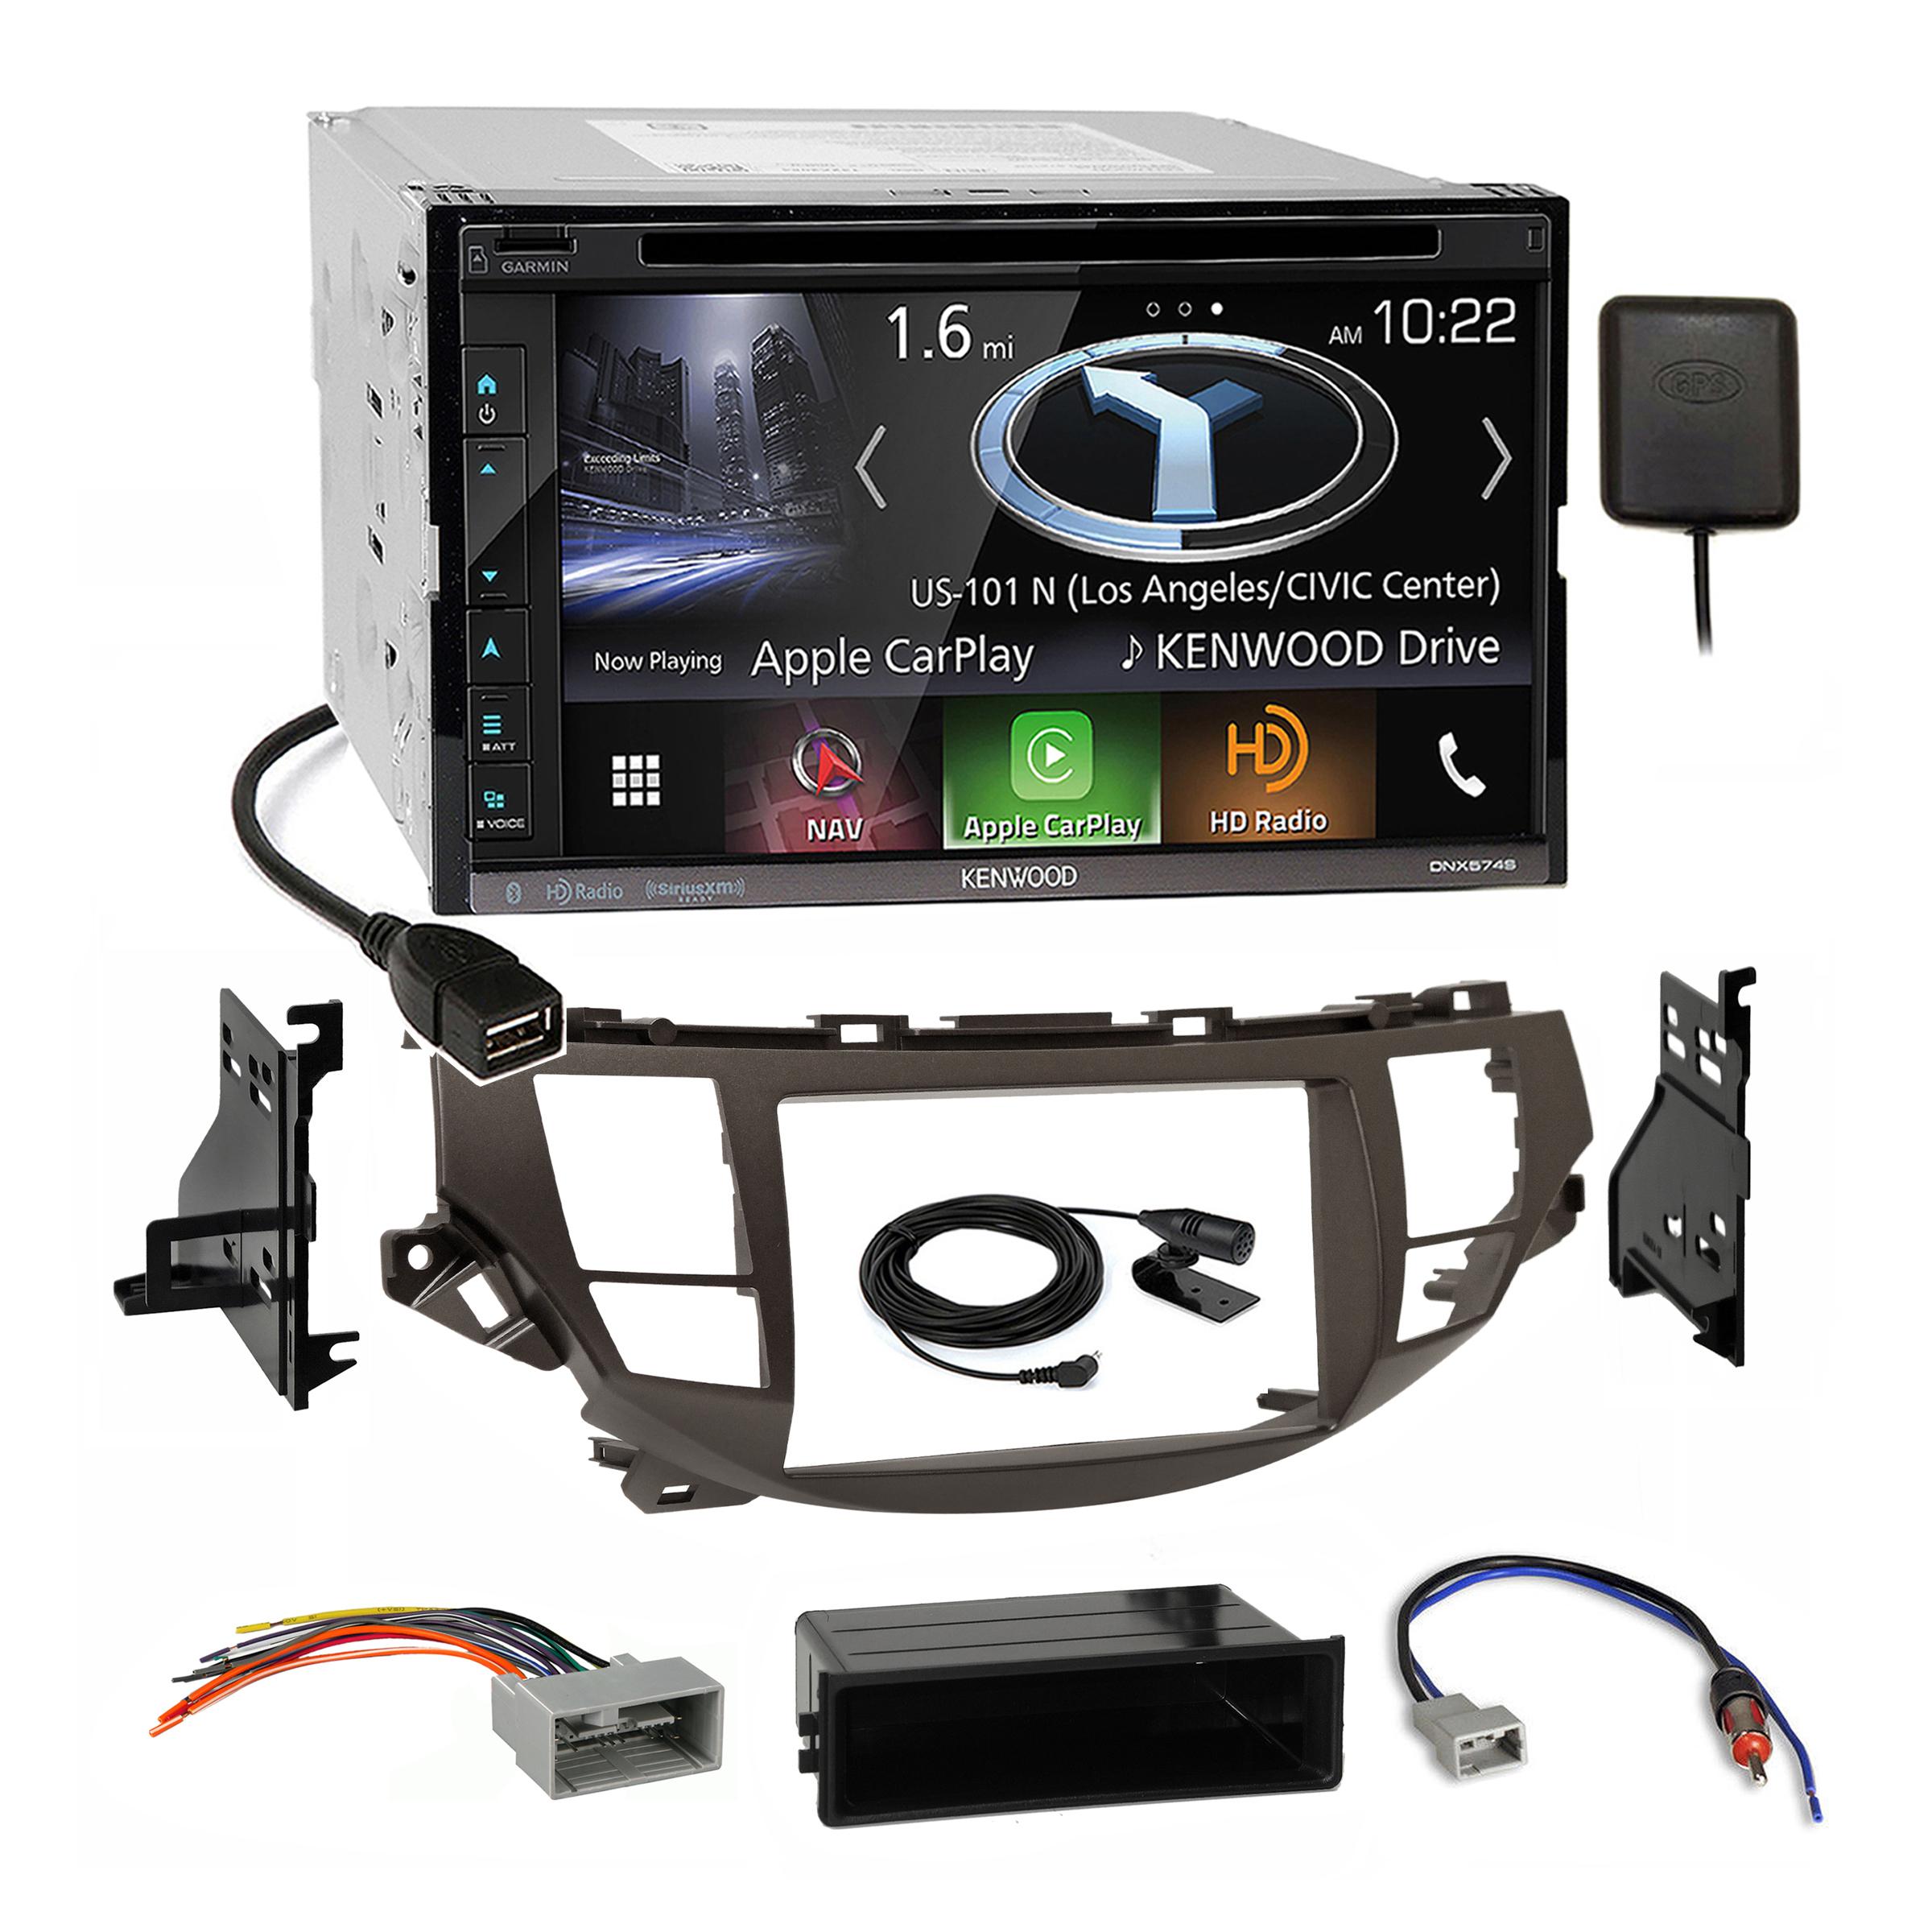 Kenwood Gps Carplay Stereo Taupe Dash Kit Harness For Honda Accord